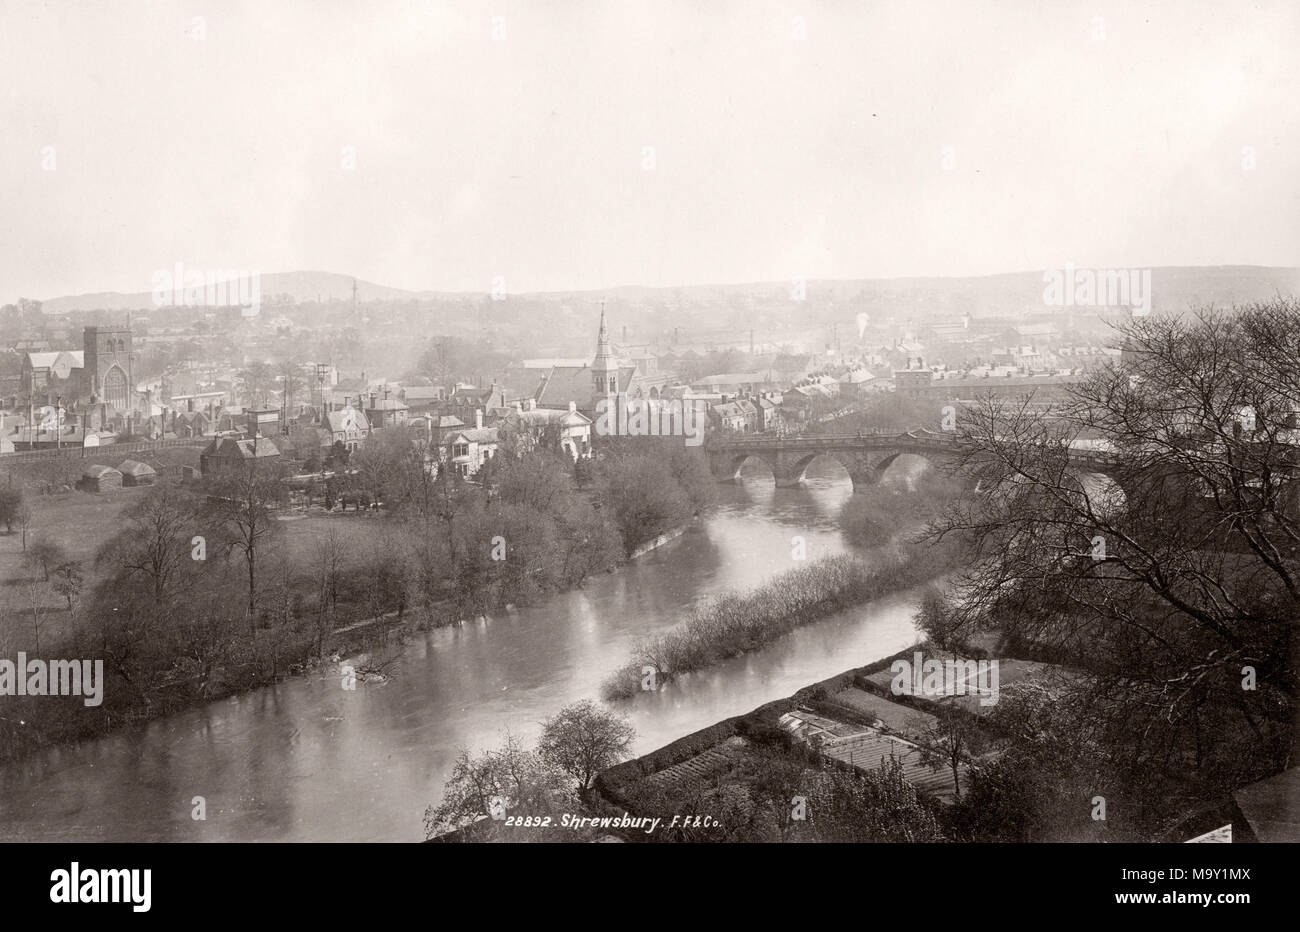 Vintage 19th century photograph - United Kingdom - Shrewsbury and the River Severn Stock Photo